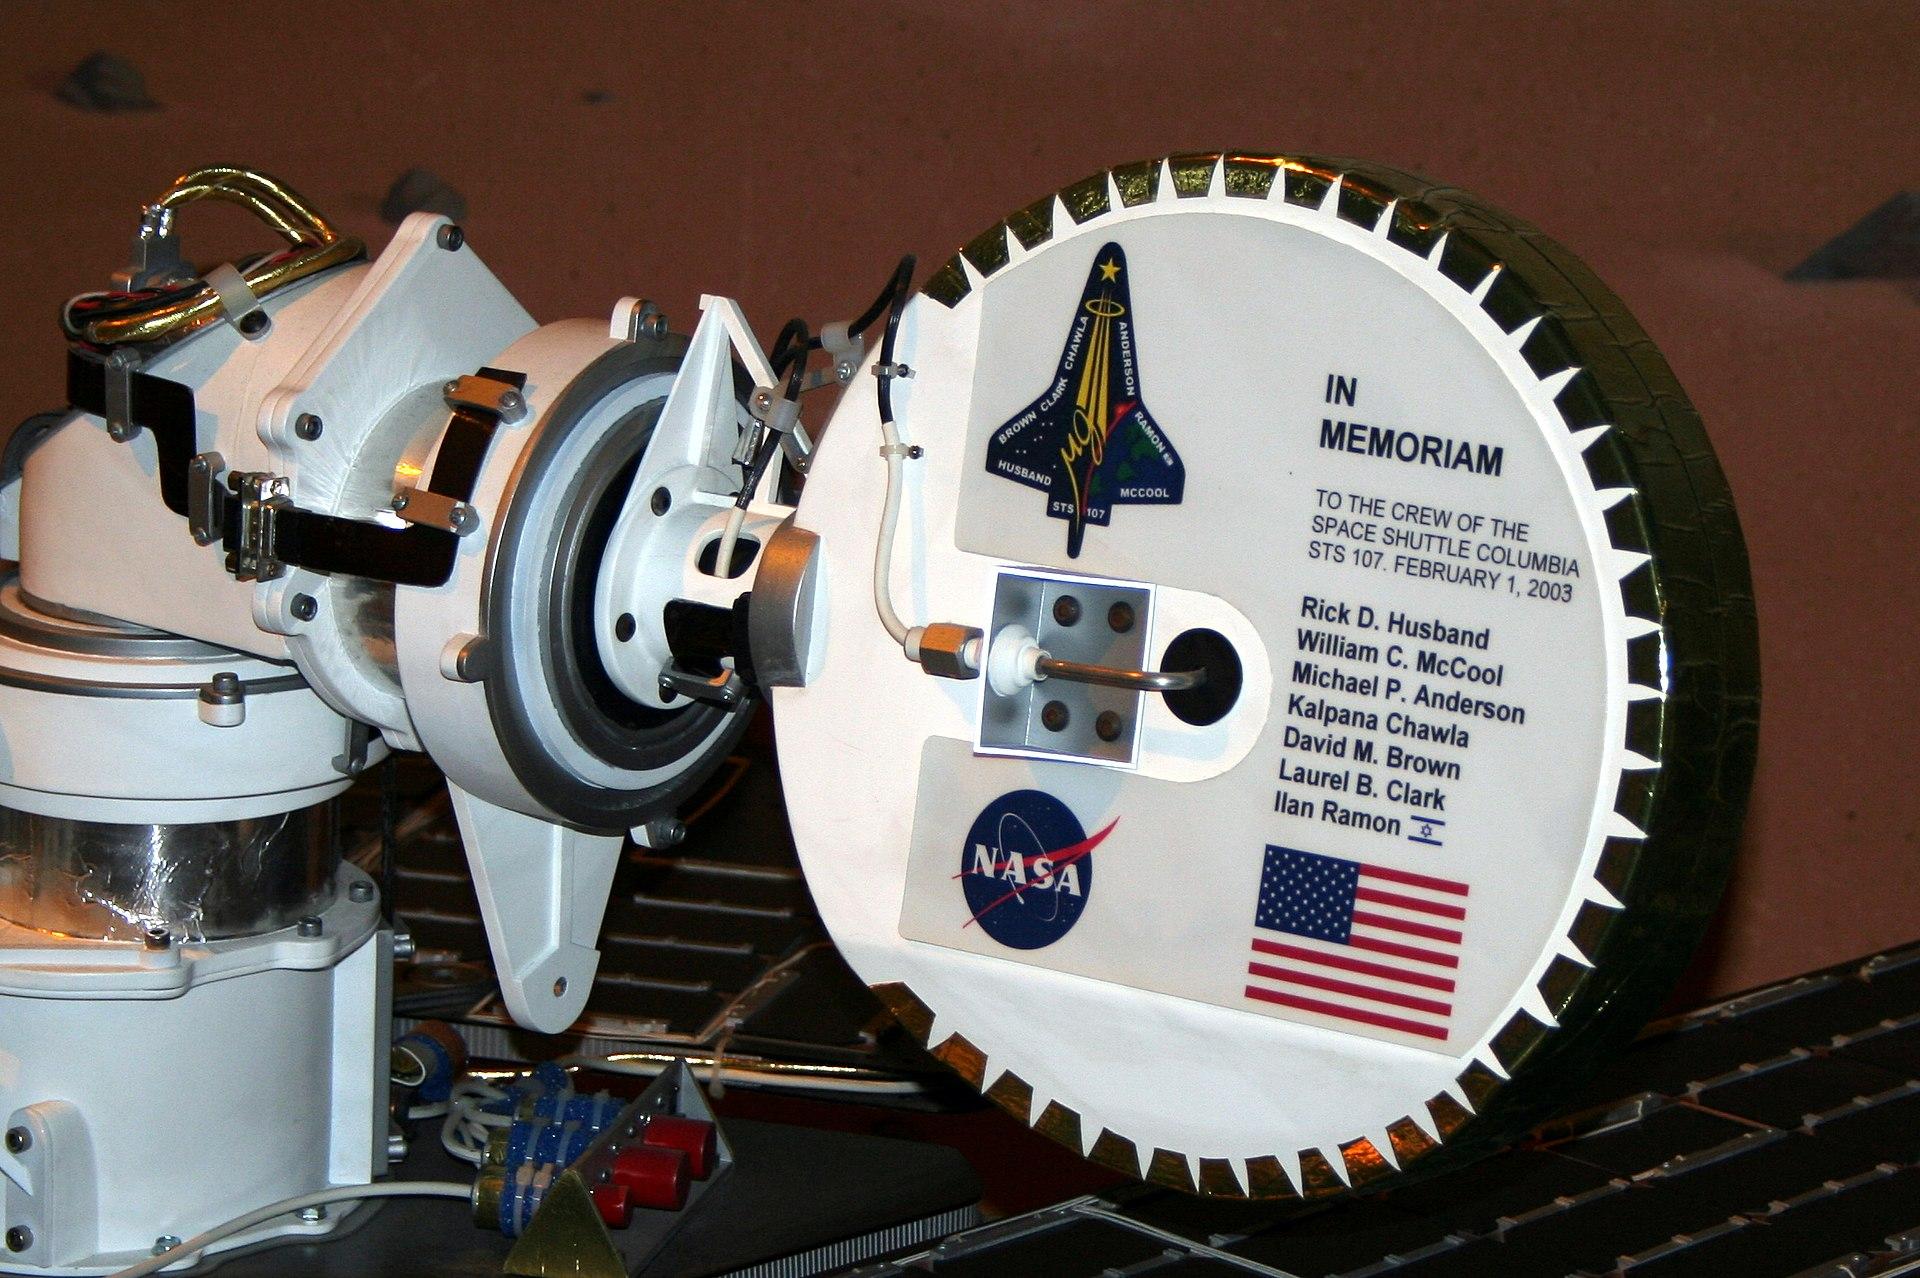 mars rover ultimo mensaje - photo #28